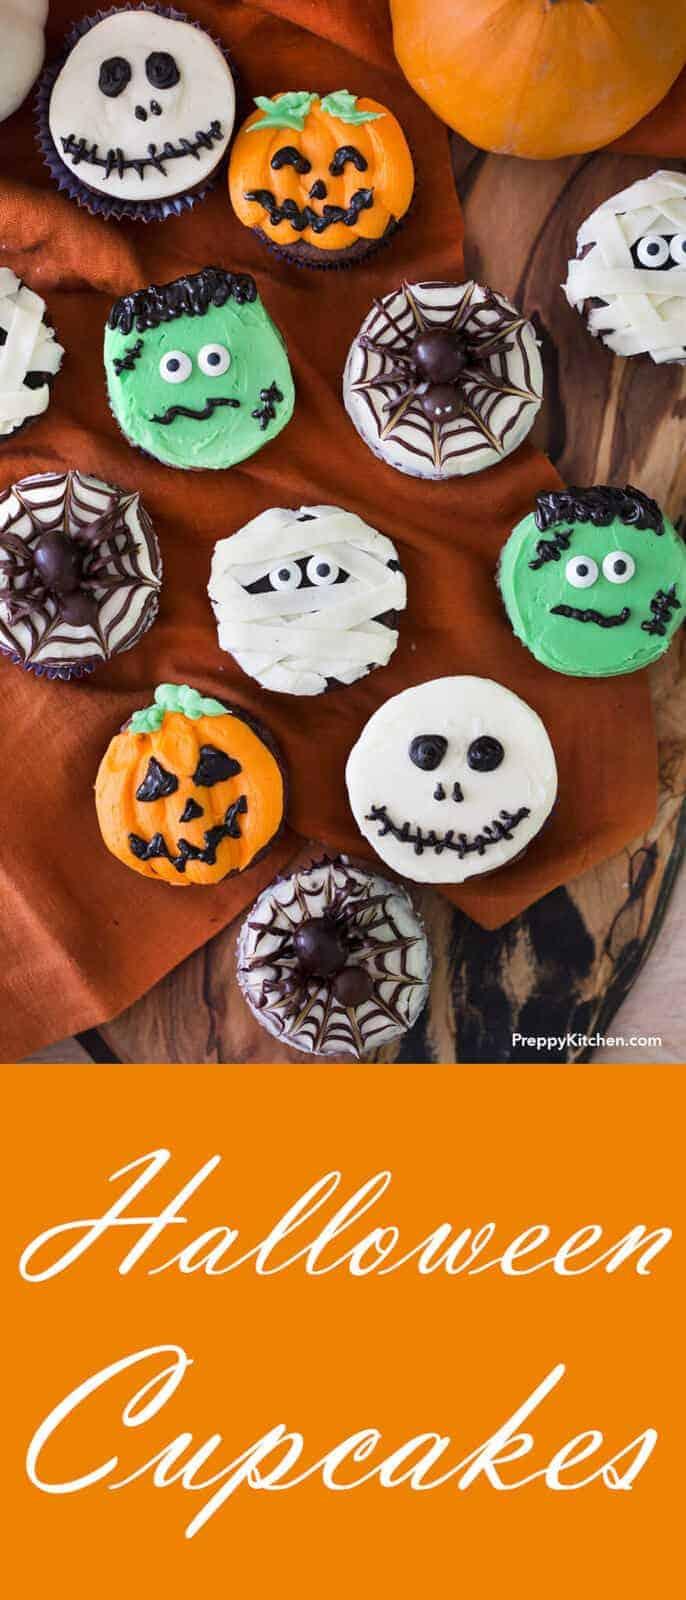 halloween cupcakes - preppy kitchen